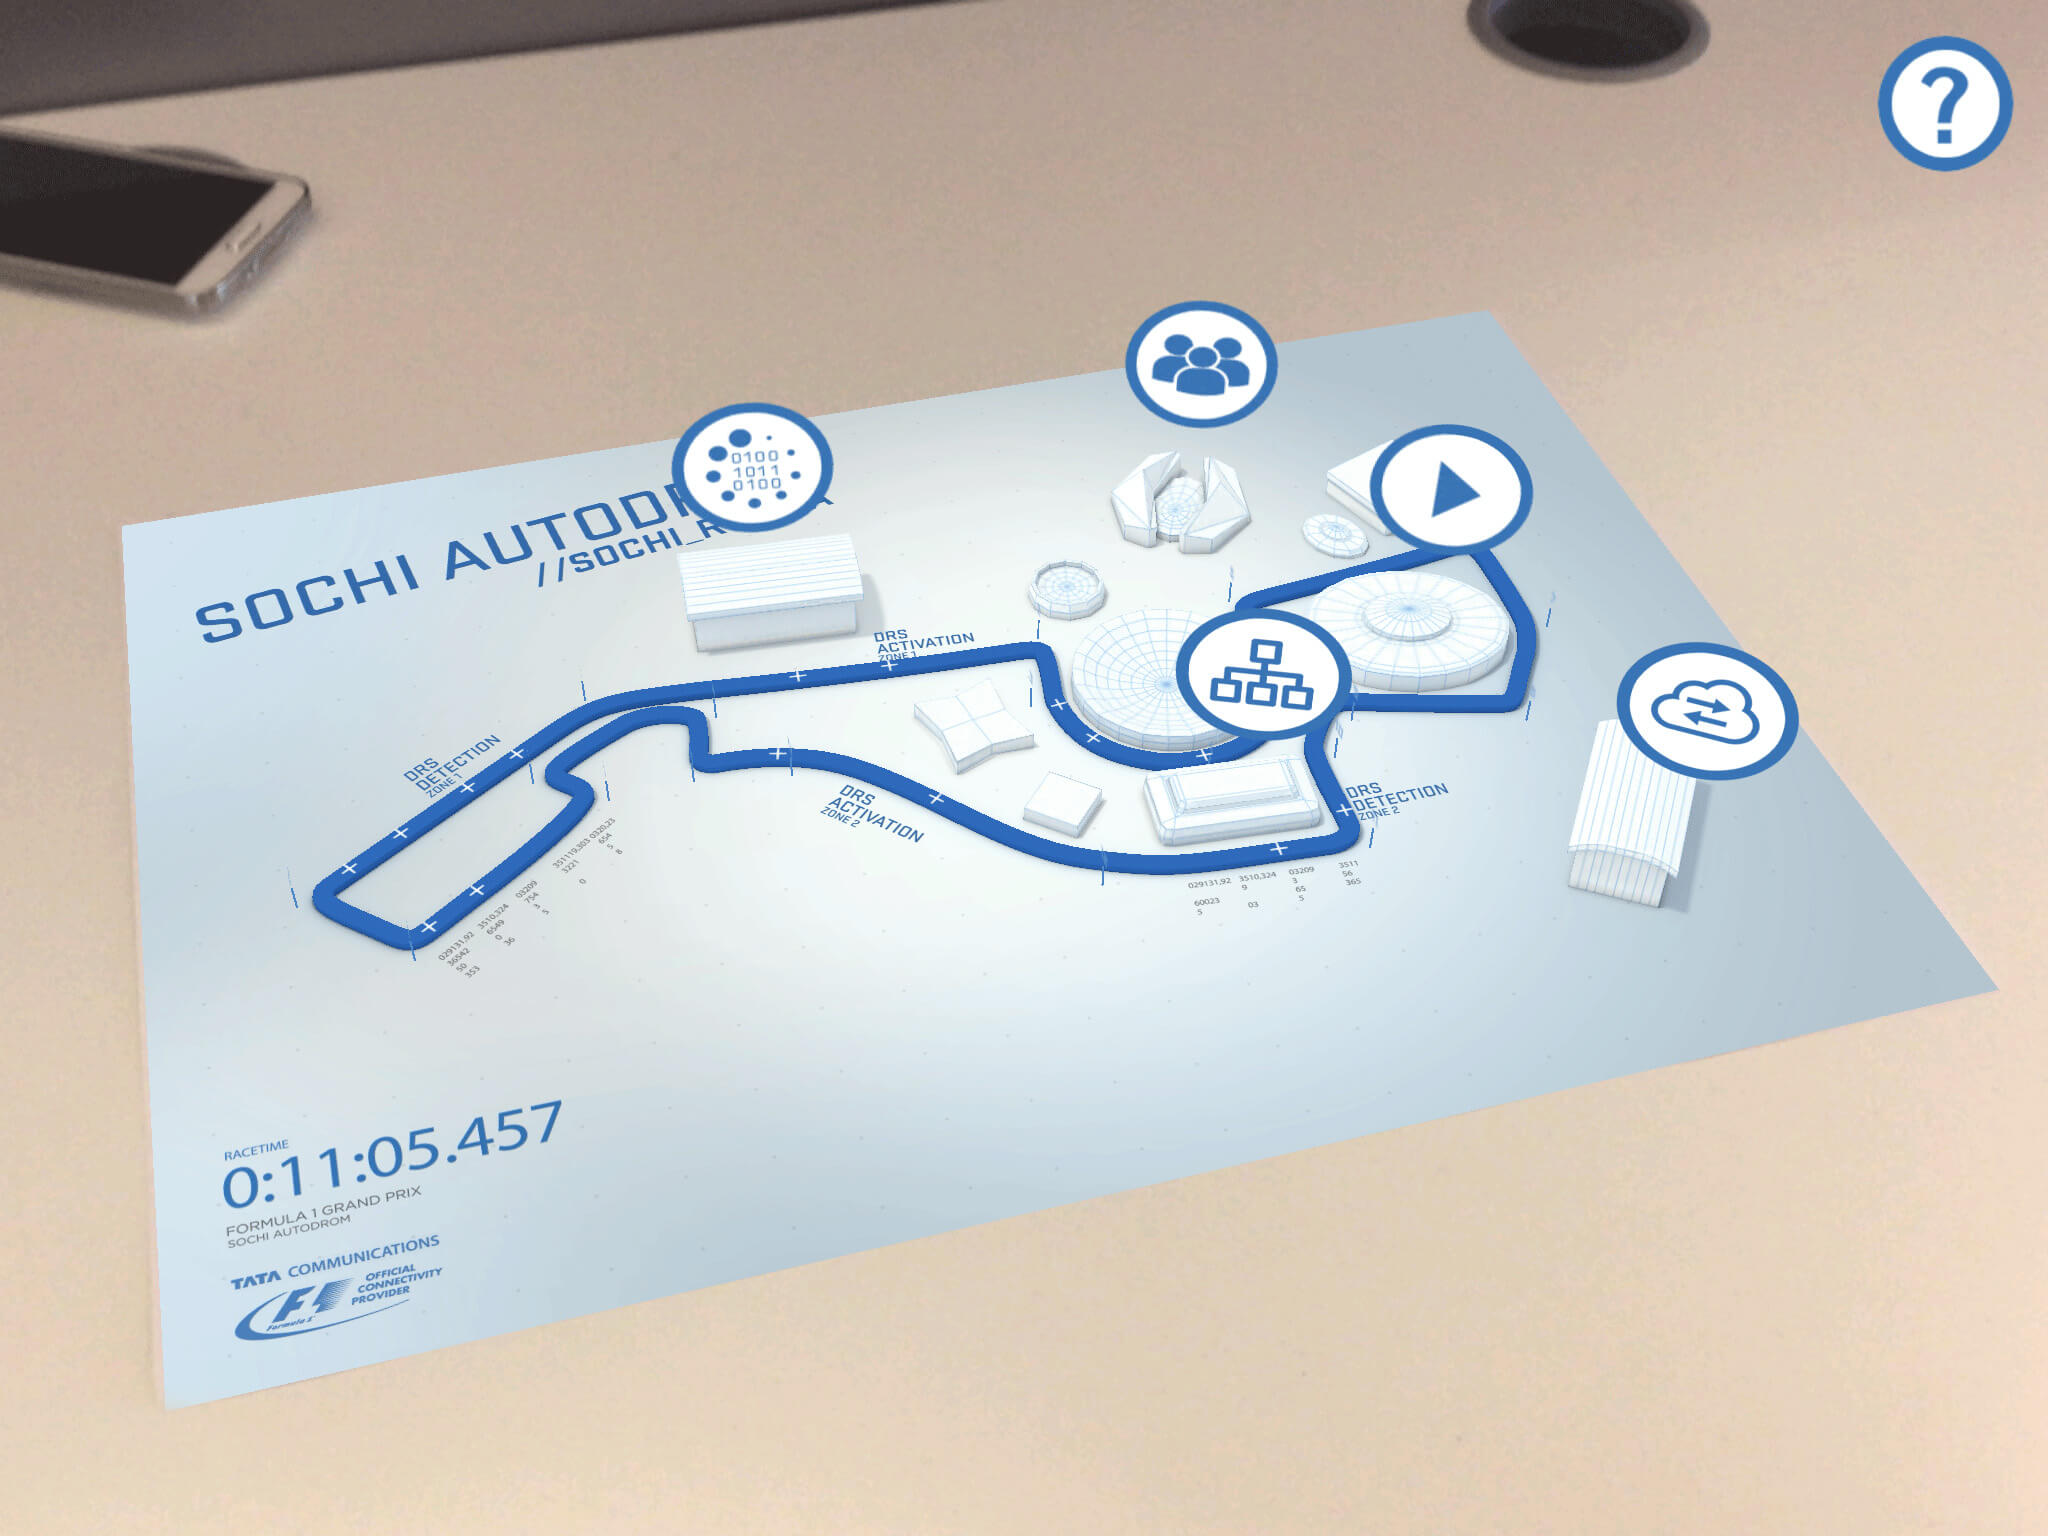 Tata_F1_AR_App_04_NavigationTrack.jpg